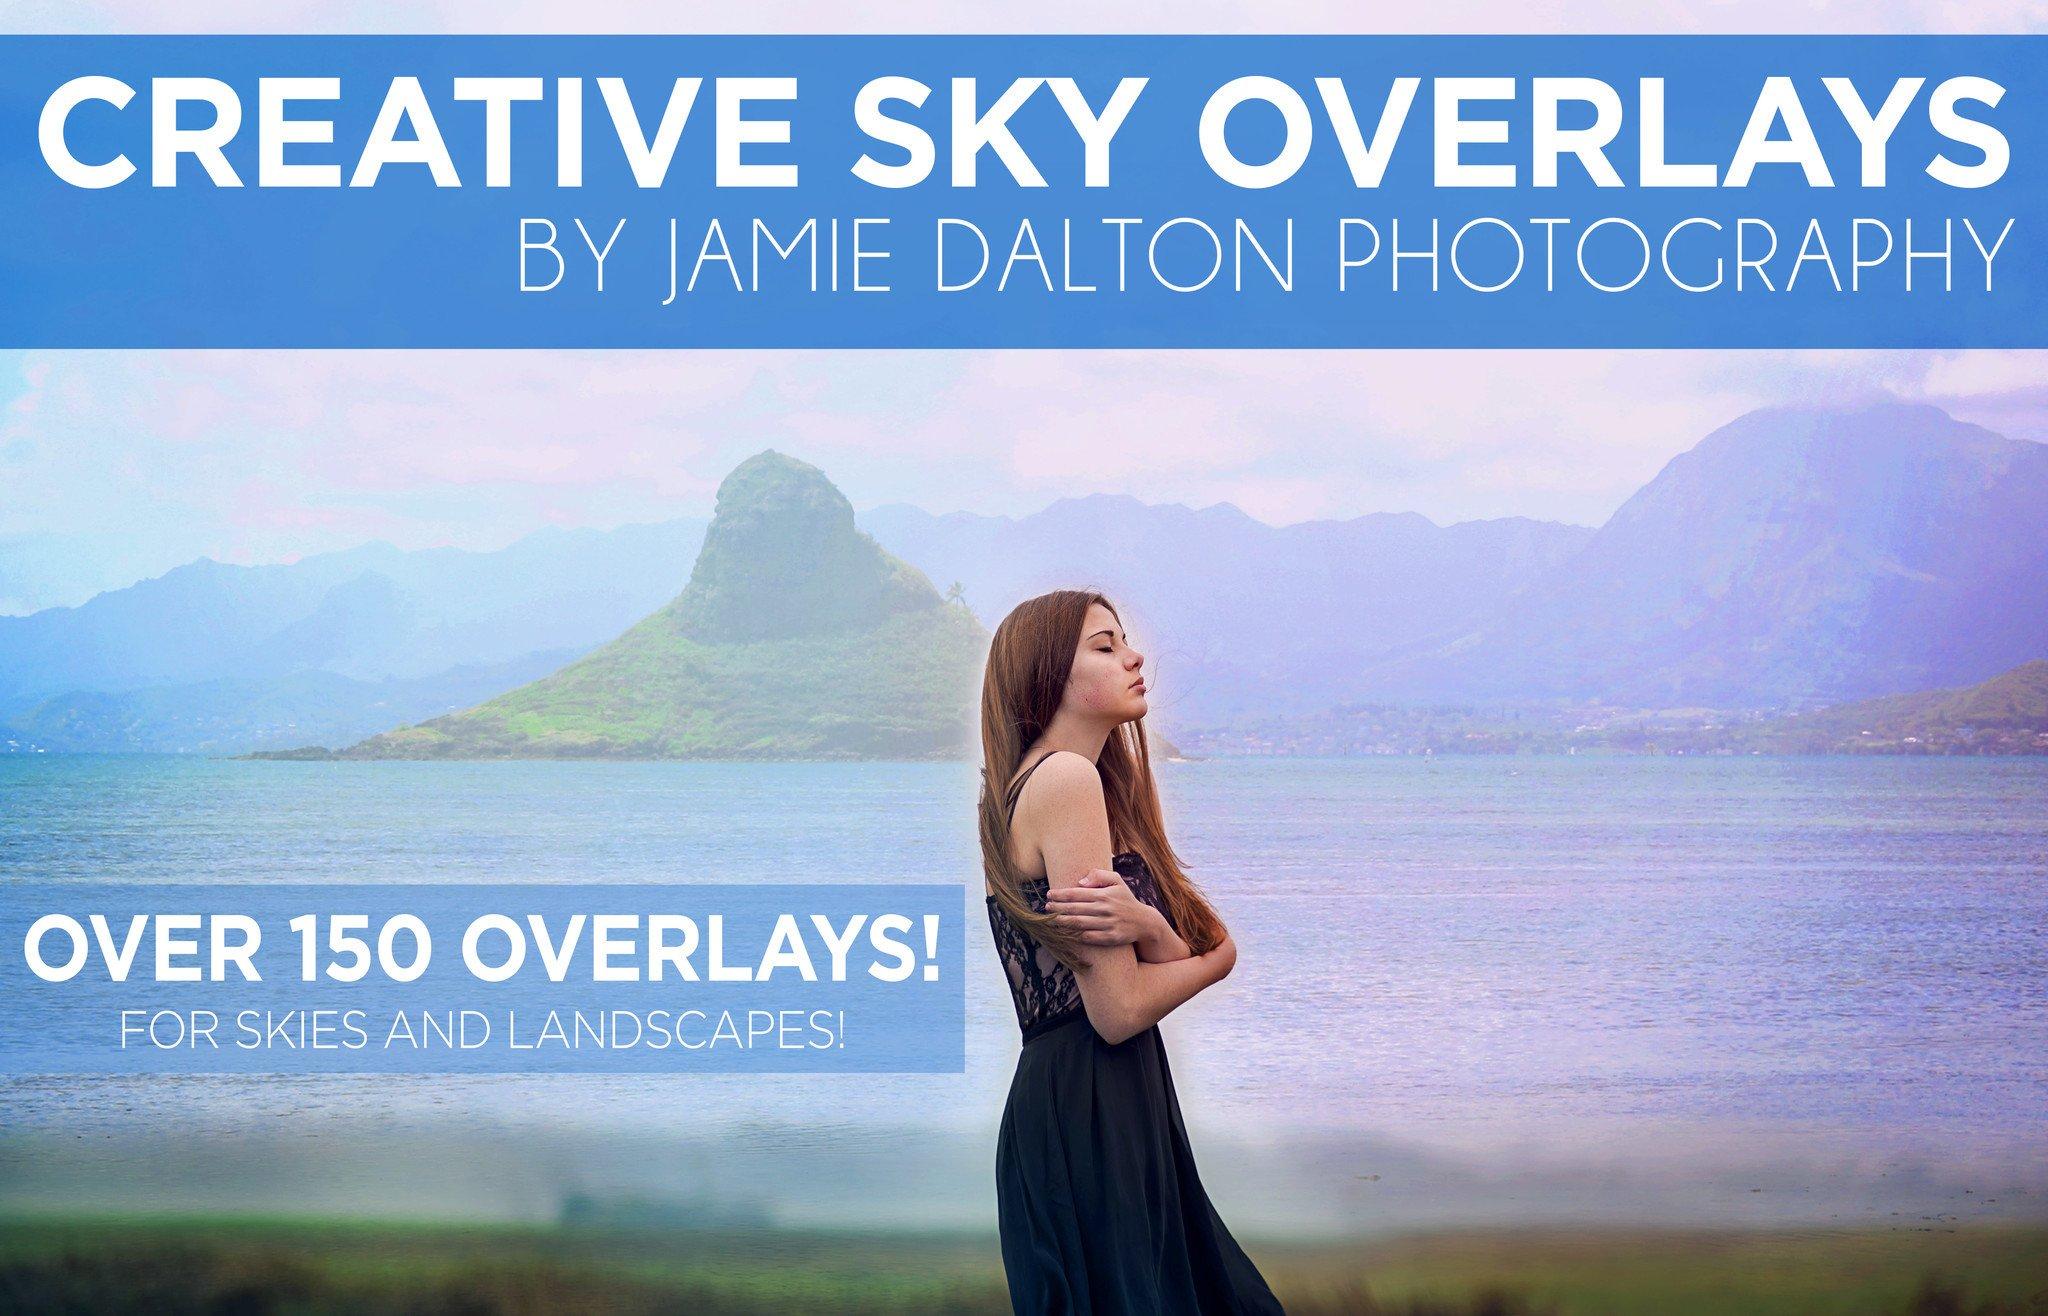 creative_sky_overlays_32a3098f-7716-46f9-b357-67c052bba8aa.jpg